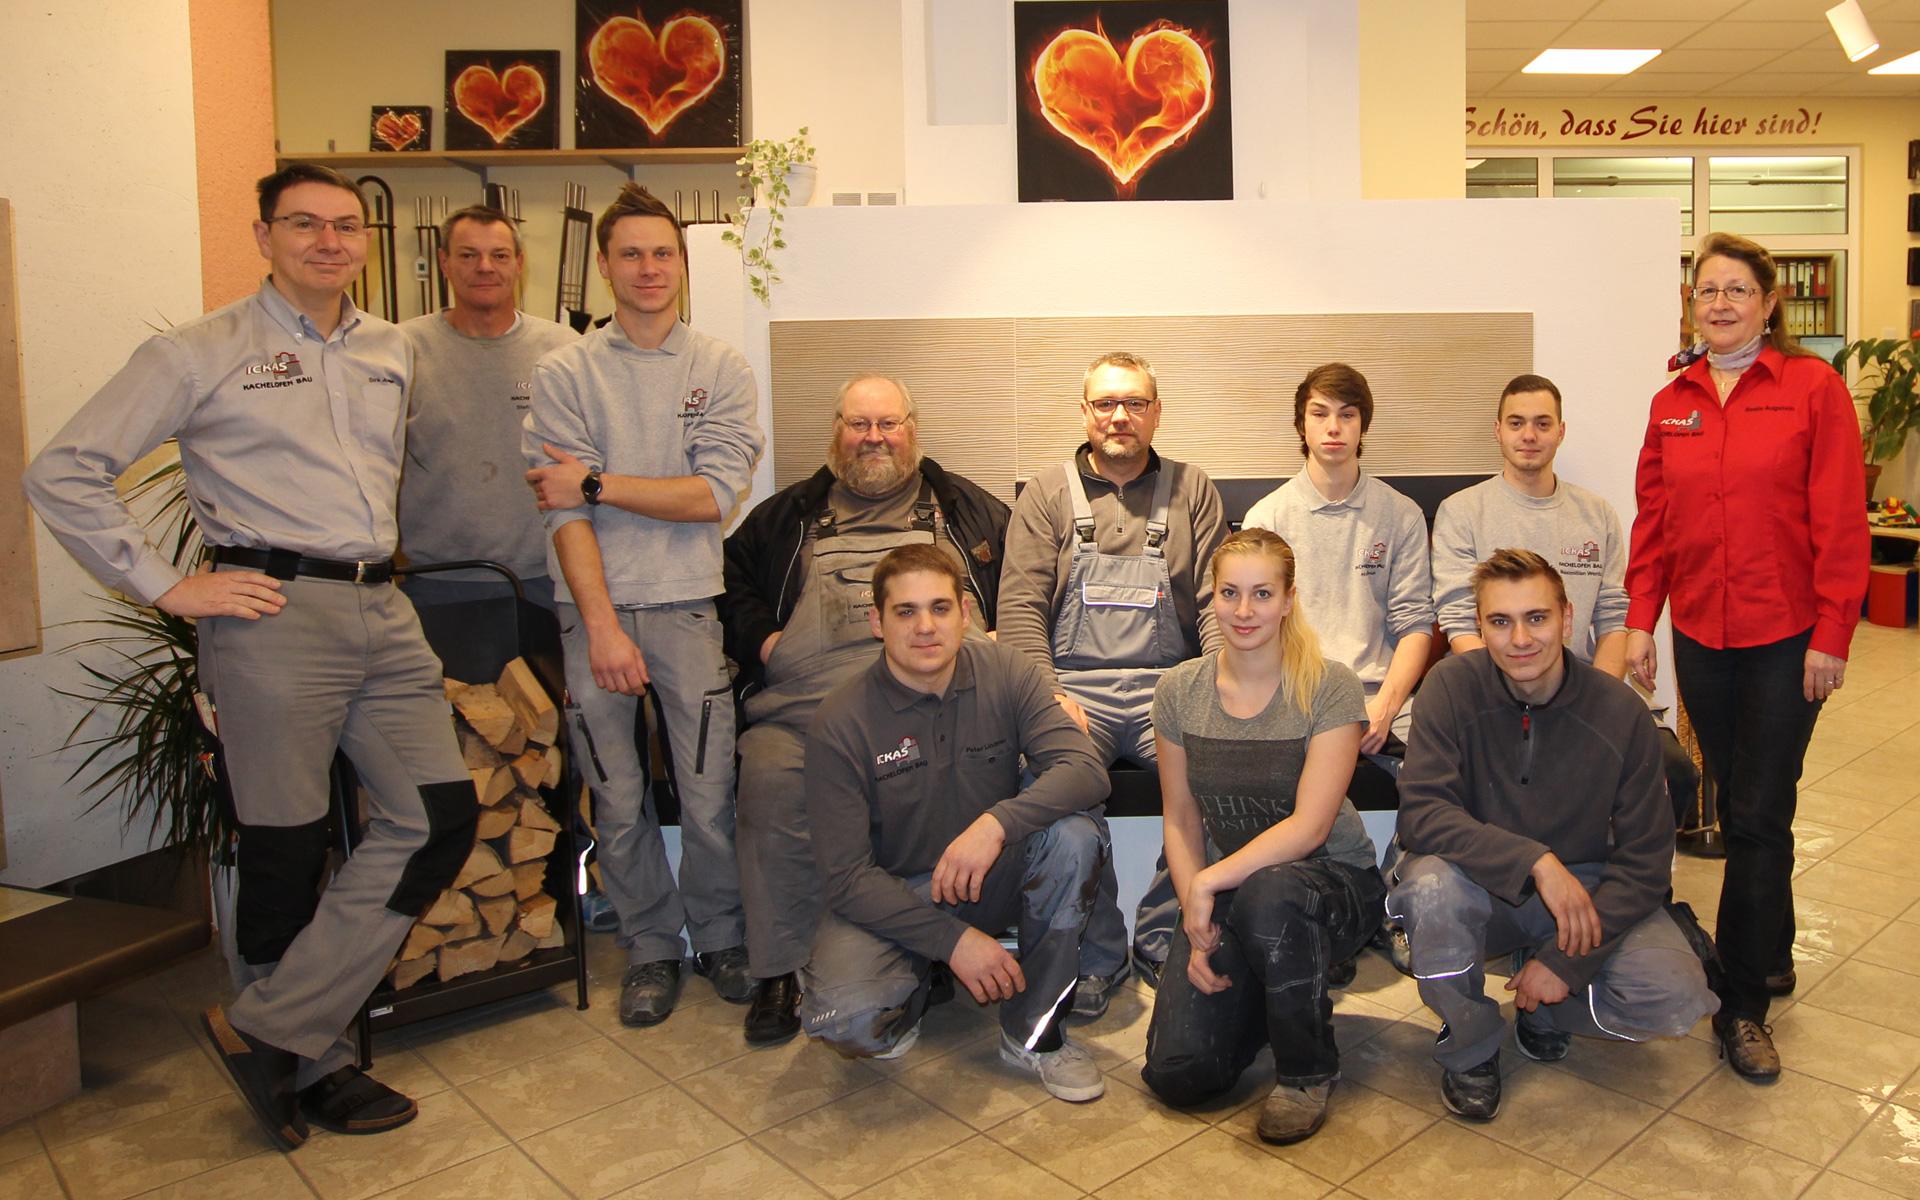 ickas-kachelofen-kamin-ludwigshafen-team